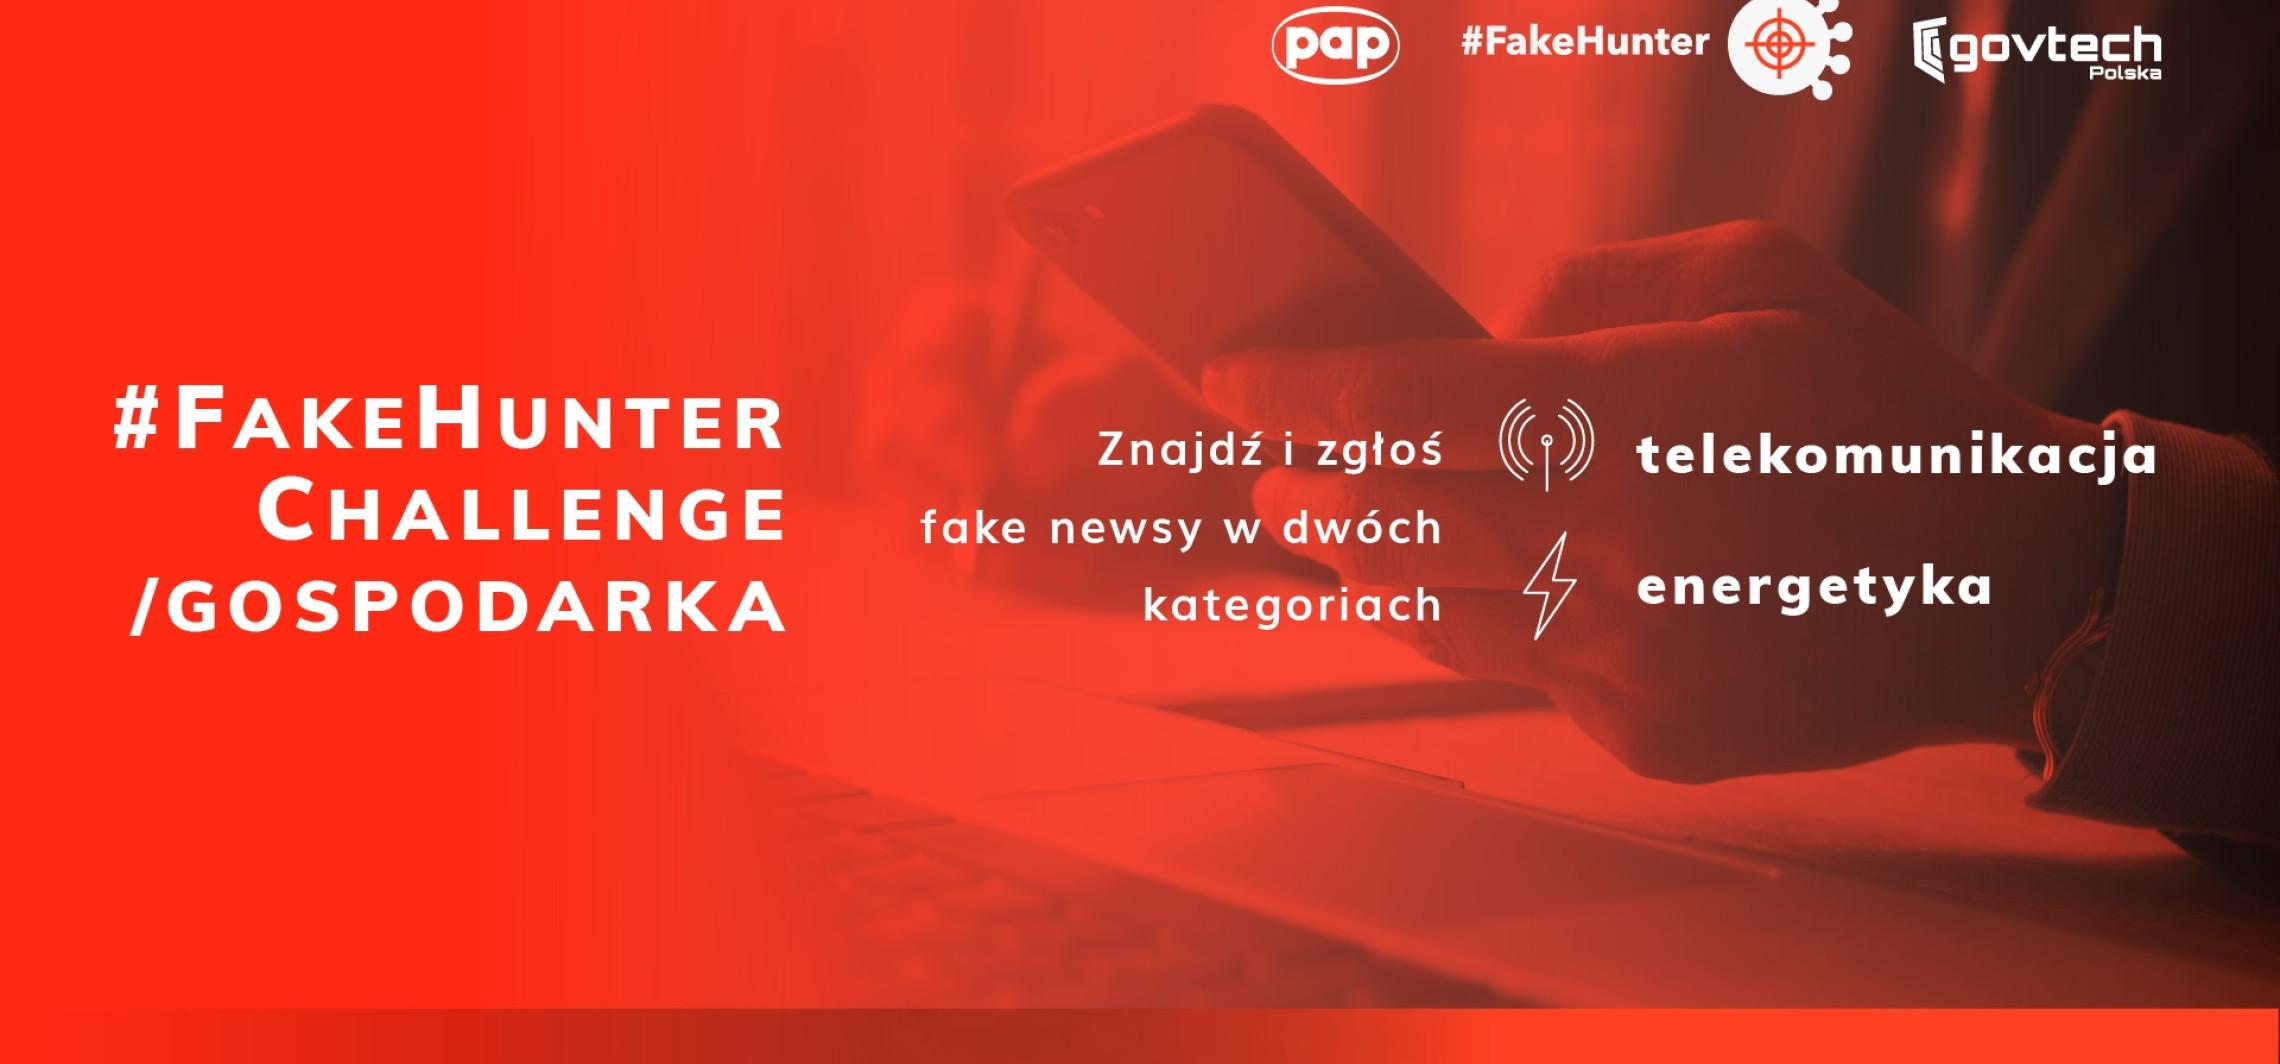 Kraj - 11 czerwca rusza konkurs #FakeHunter Challenge/Gospodarka